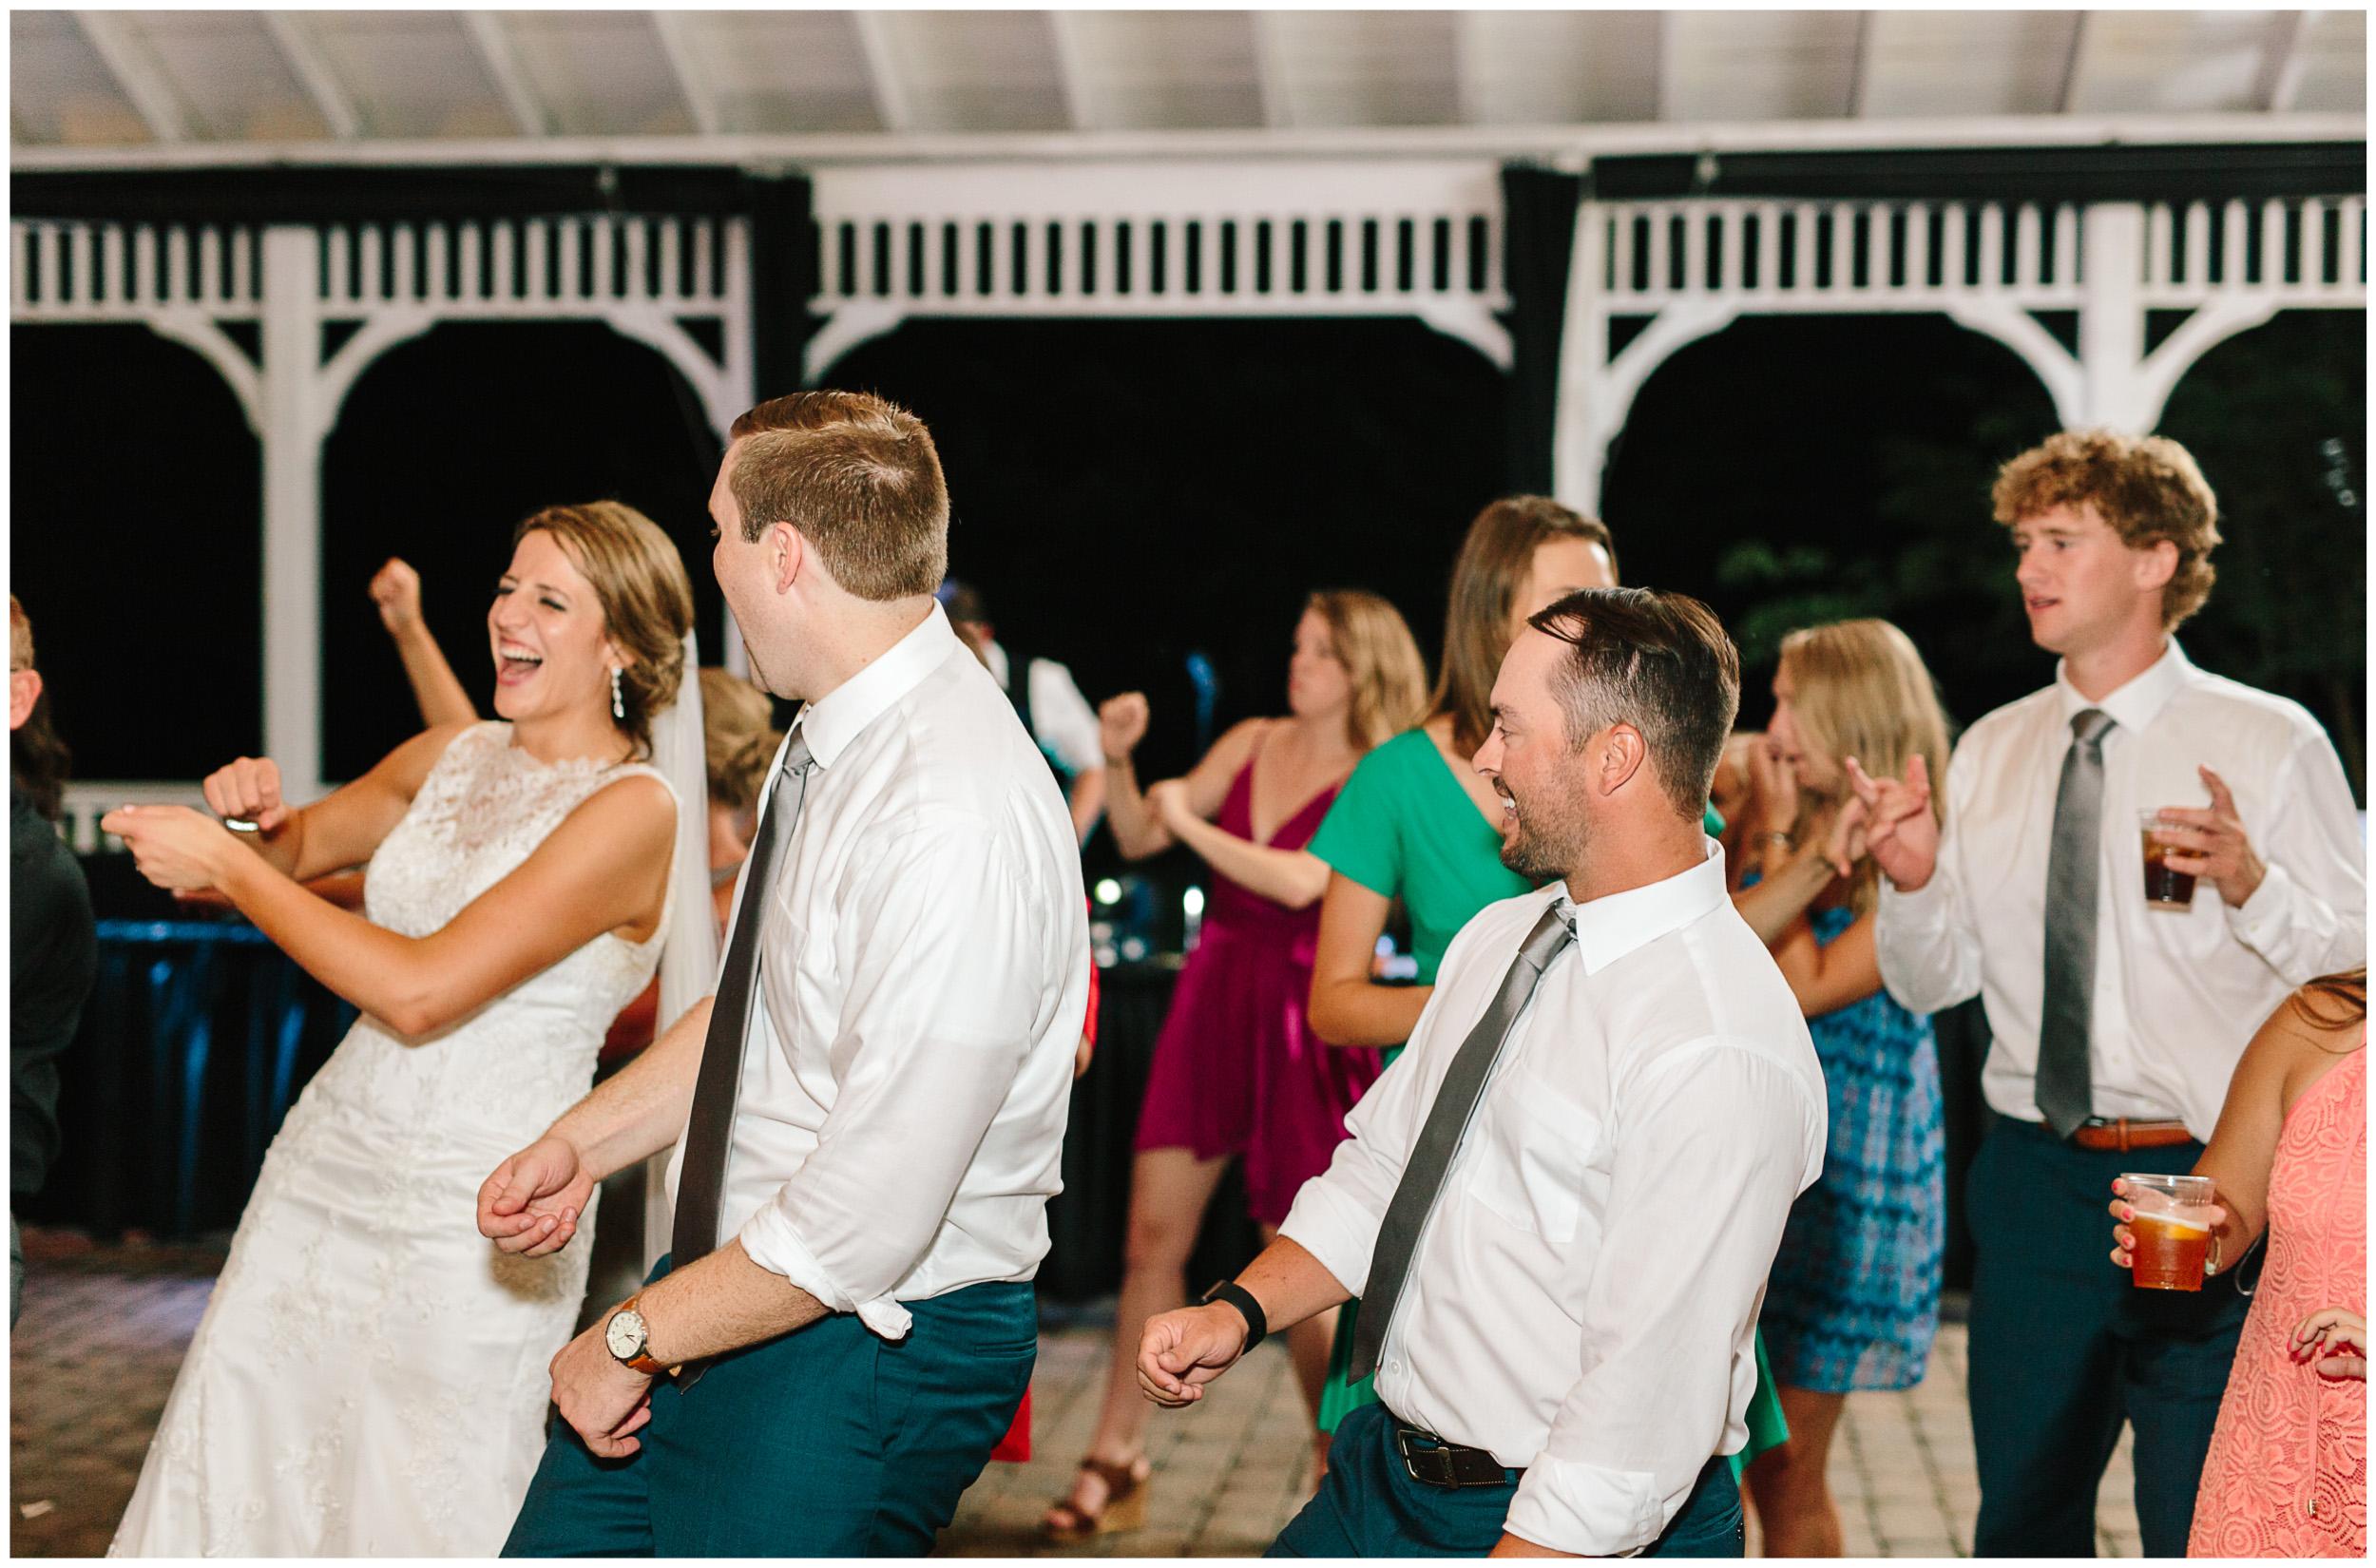 ann_arbor_michigan_wedding_109.jpg